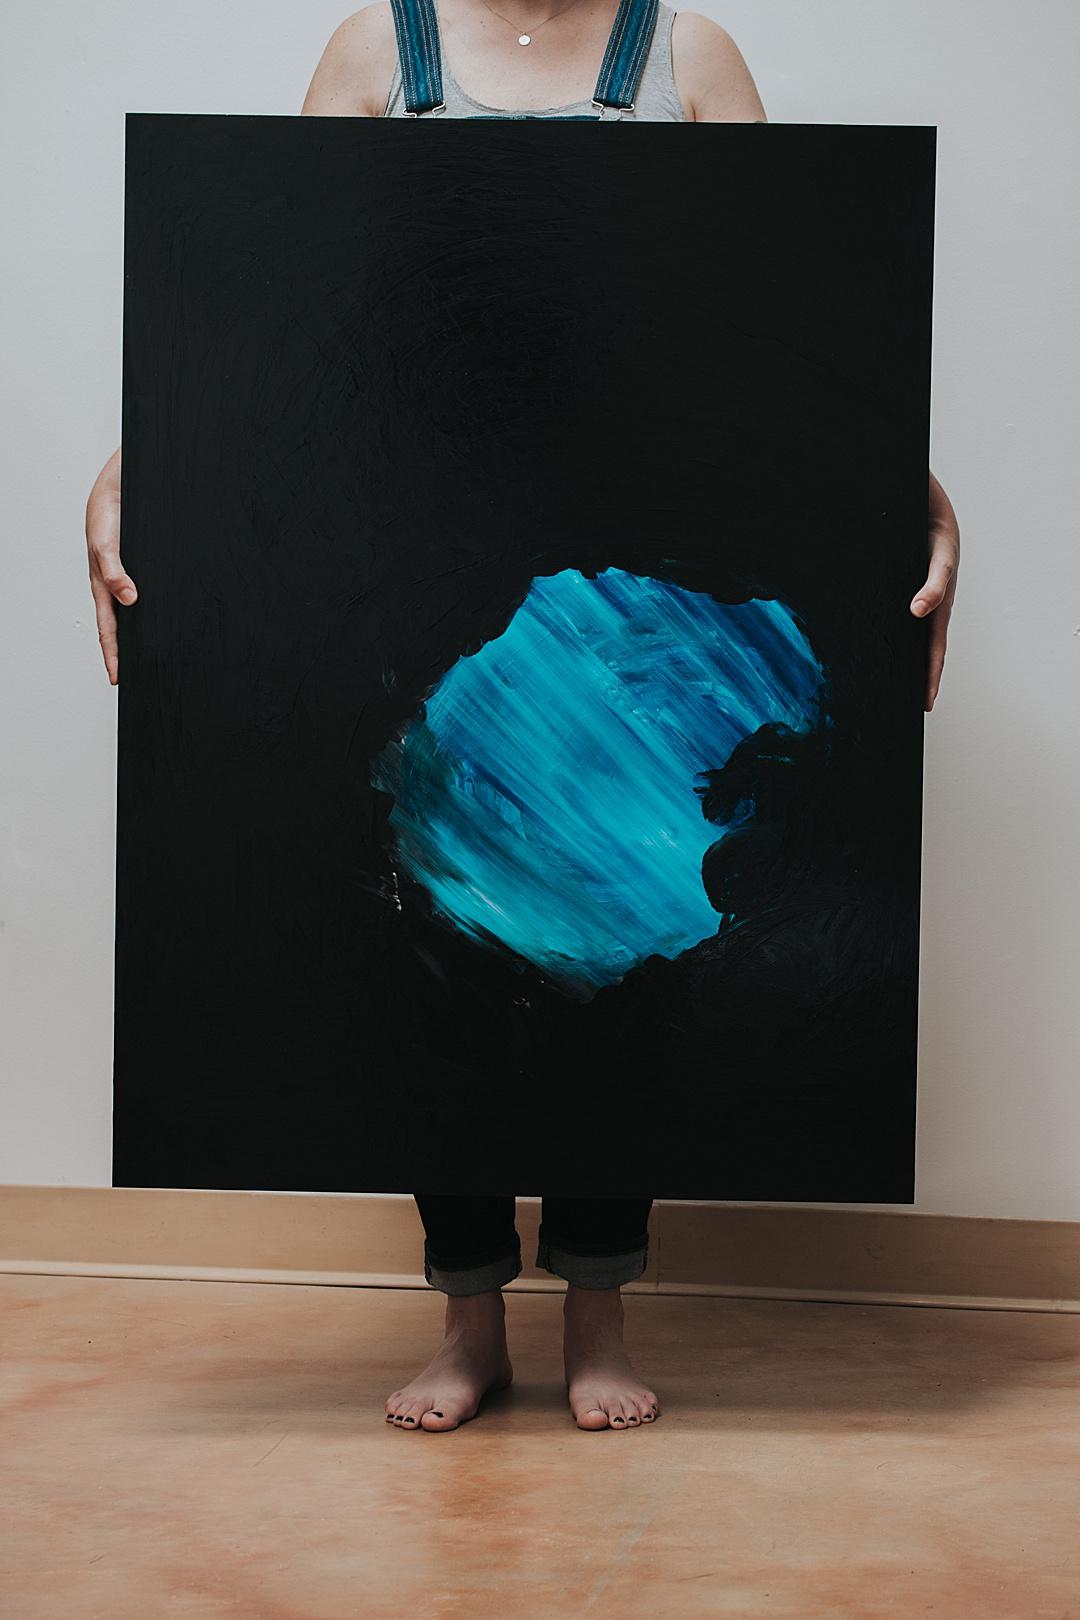 Underneath painting by Rebecca Mir Grady